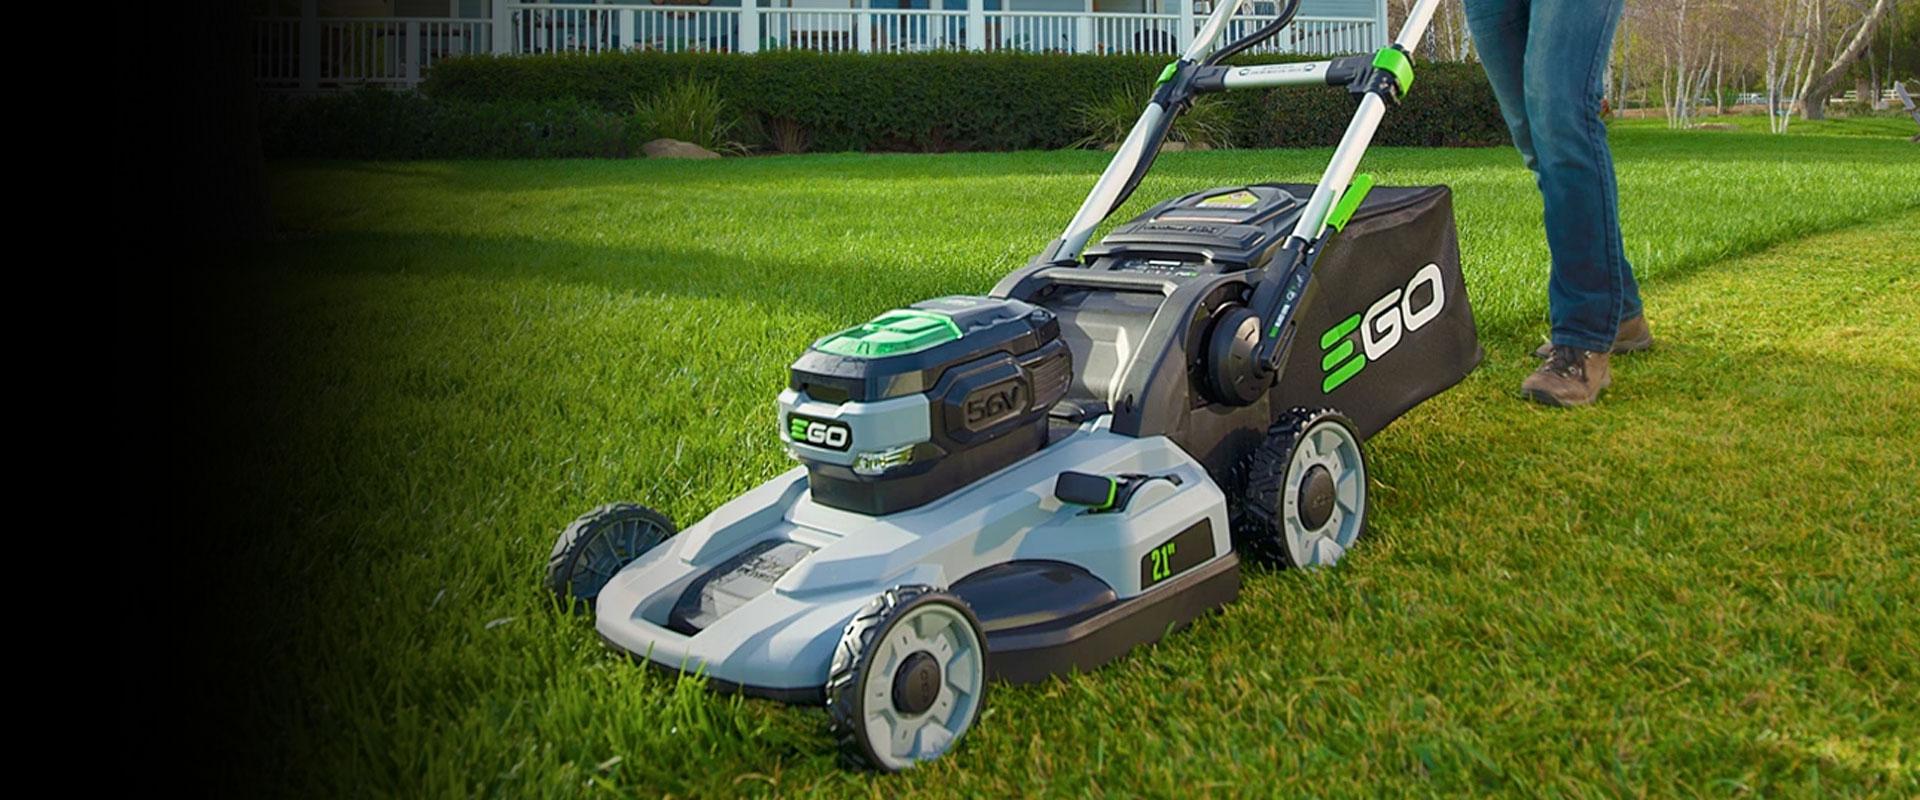 Petes-Ace-Hardware-Ego-Lawnmower